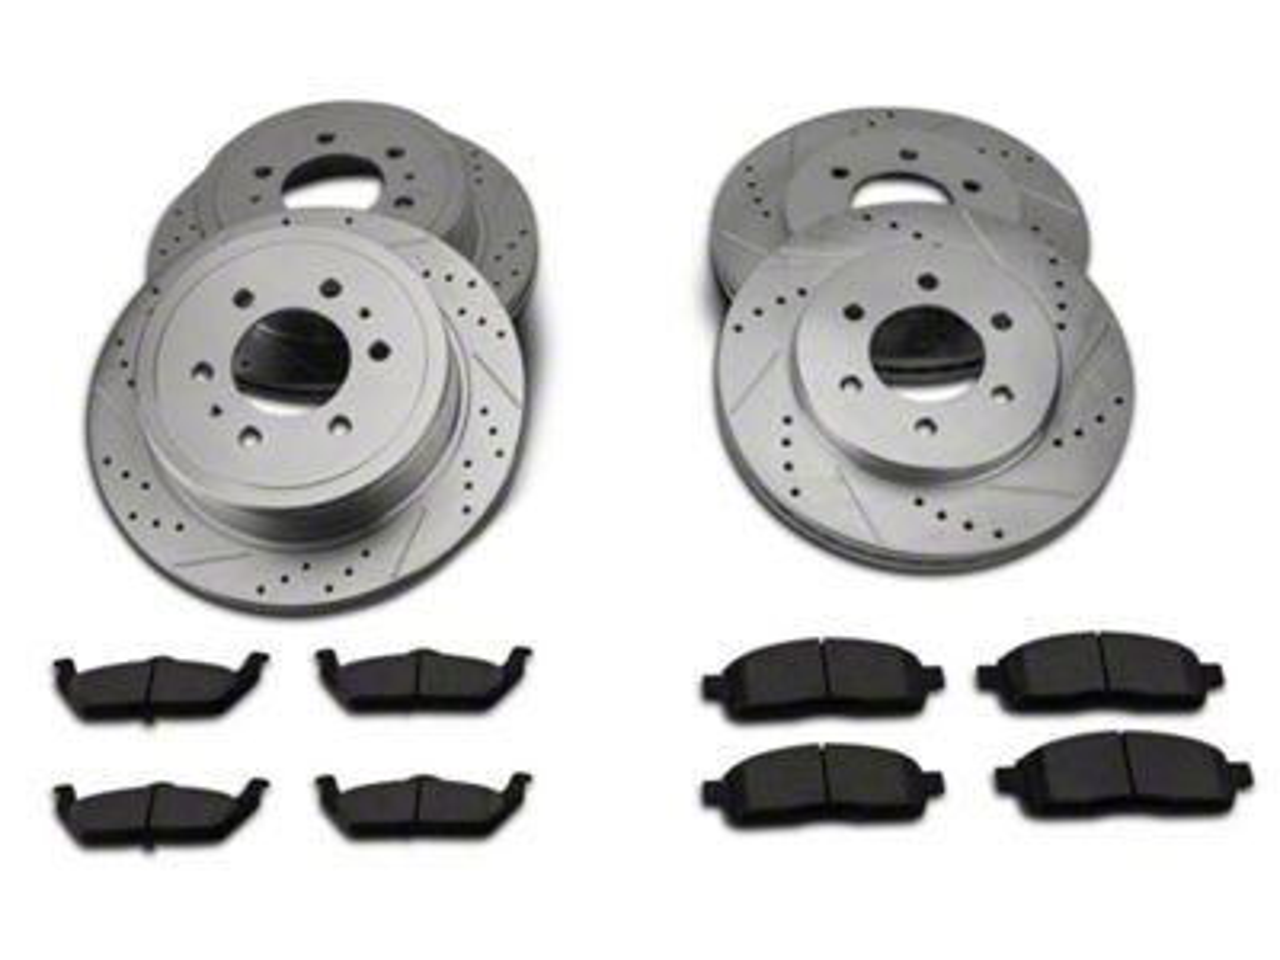 Power Stop Z23 Evolution Sport 6-Lug Brake Rotor & Pad Kit - Front & Rear (04-08 2WD F-150)